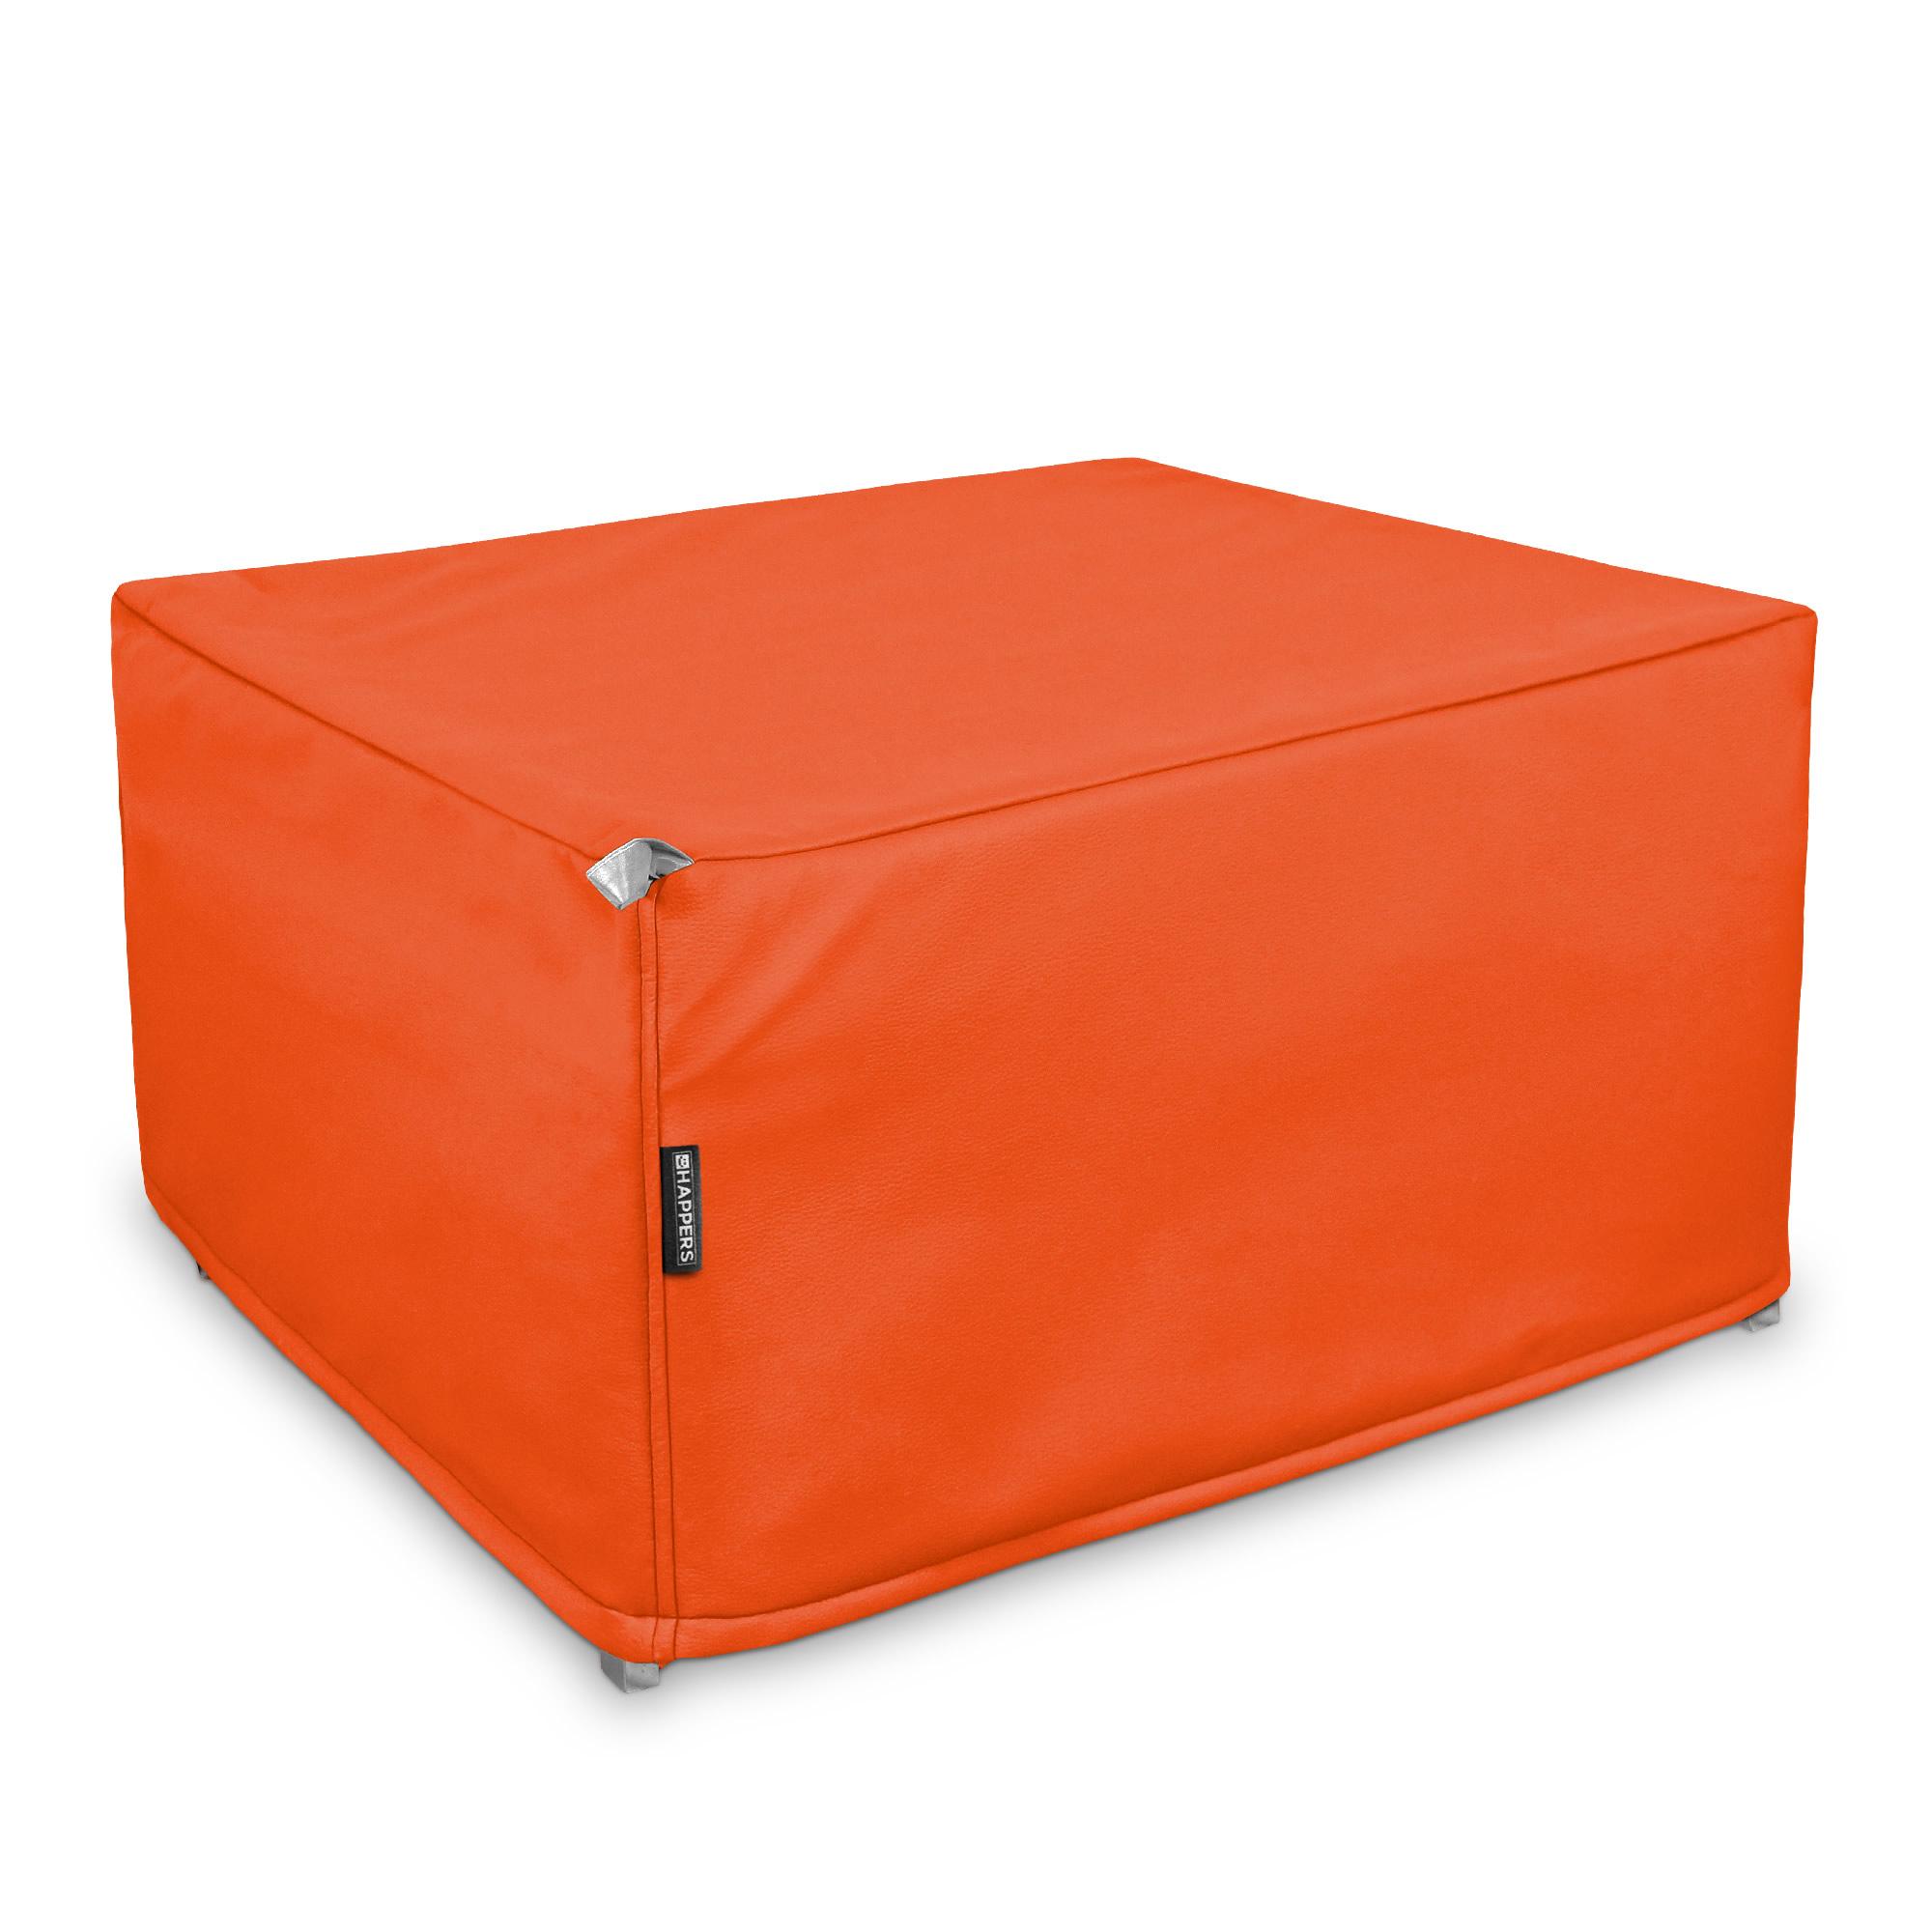 Puff Cama Somier plegable Polipiel Indoor Naranja en puffdepera.com